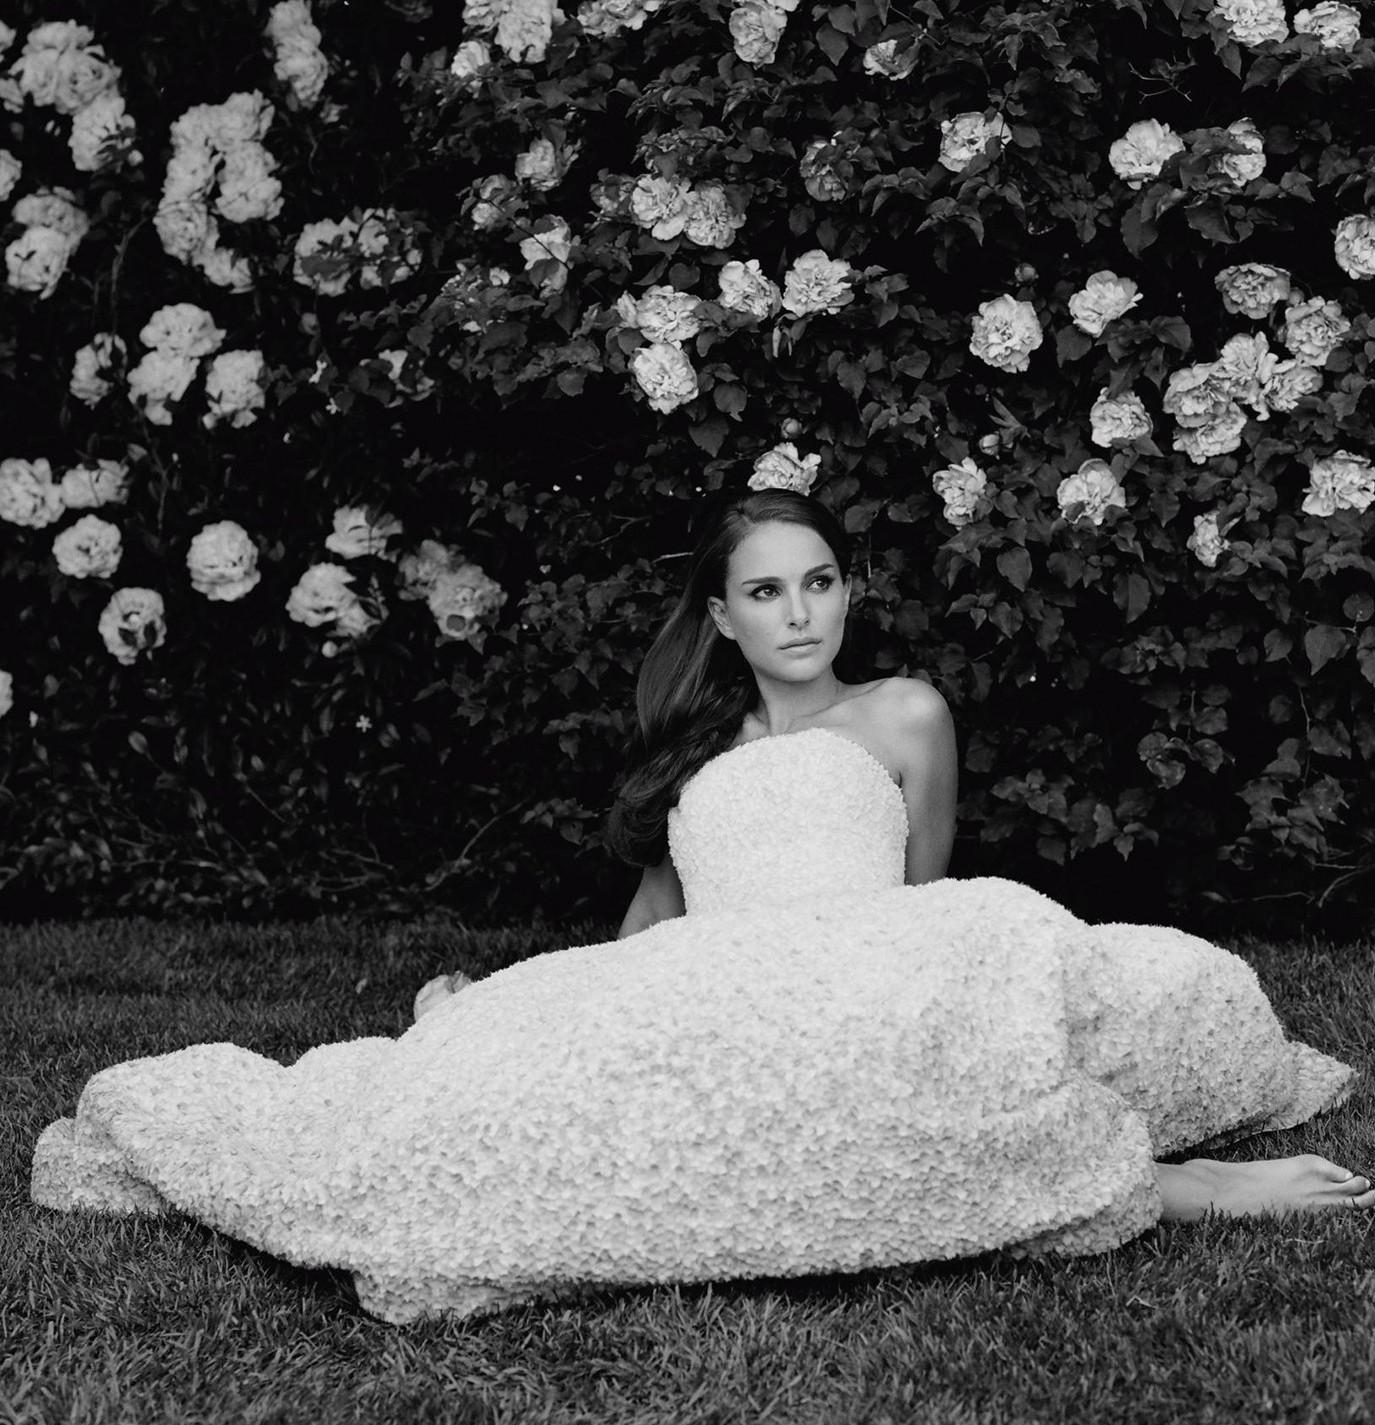 Natalie-Portman---Miss-Dior-Perfume-2013